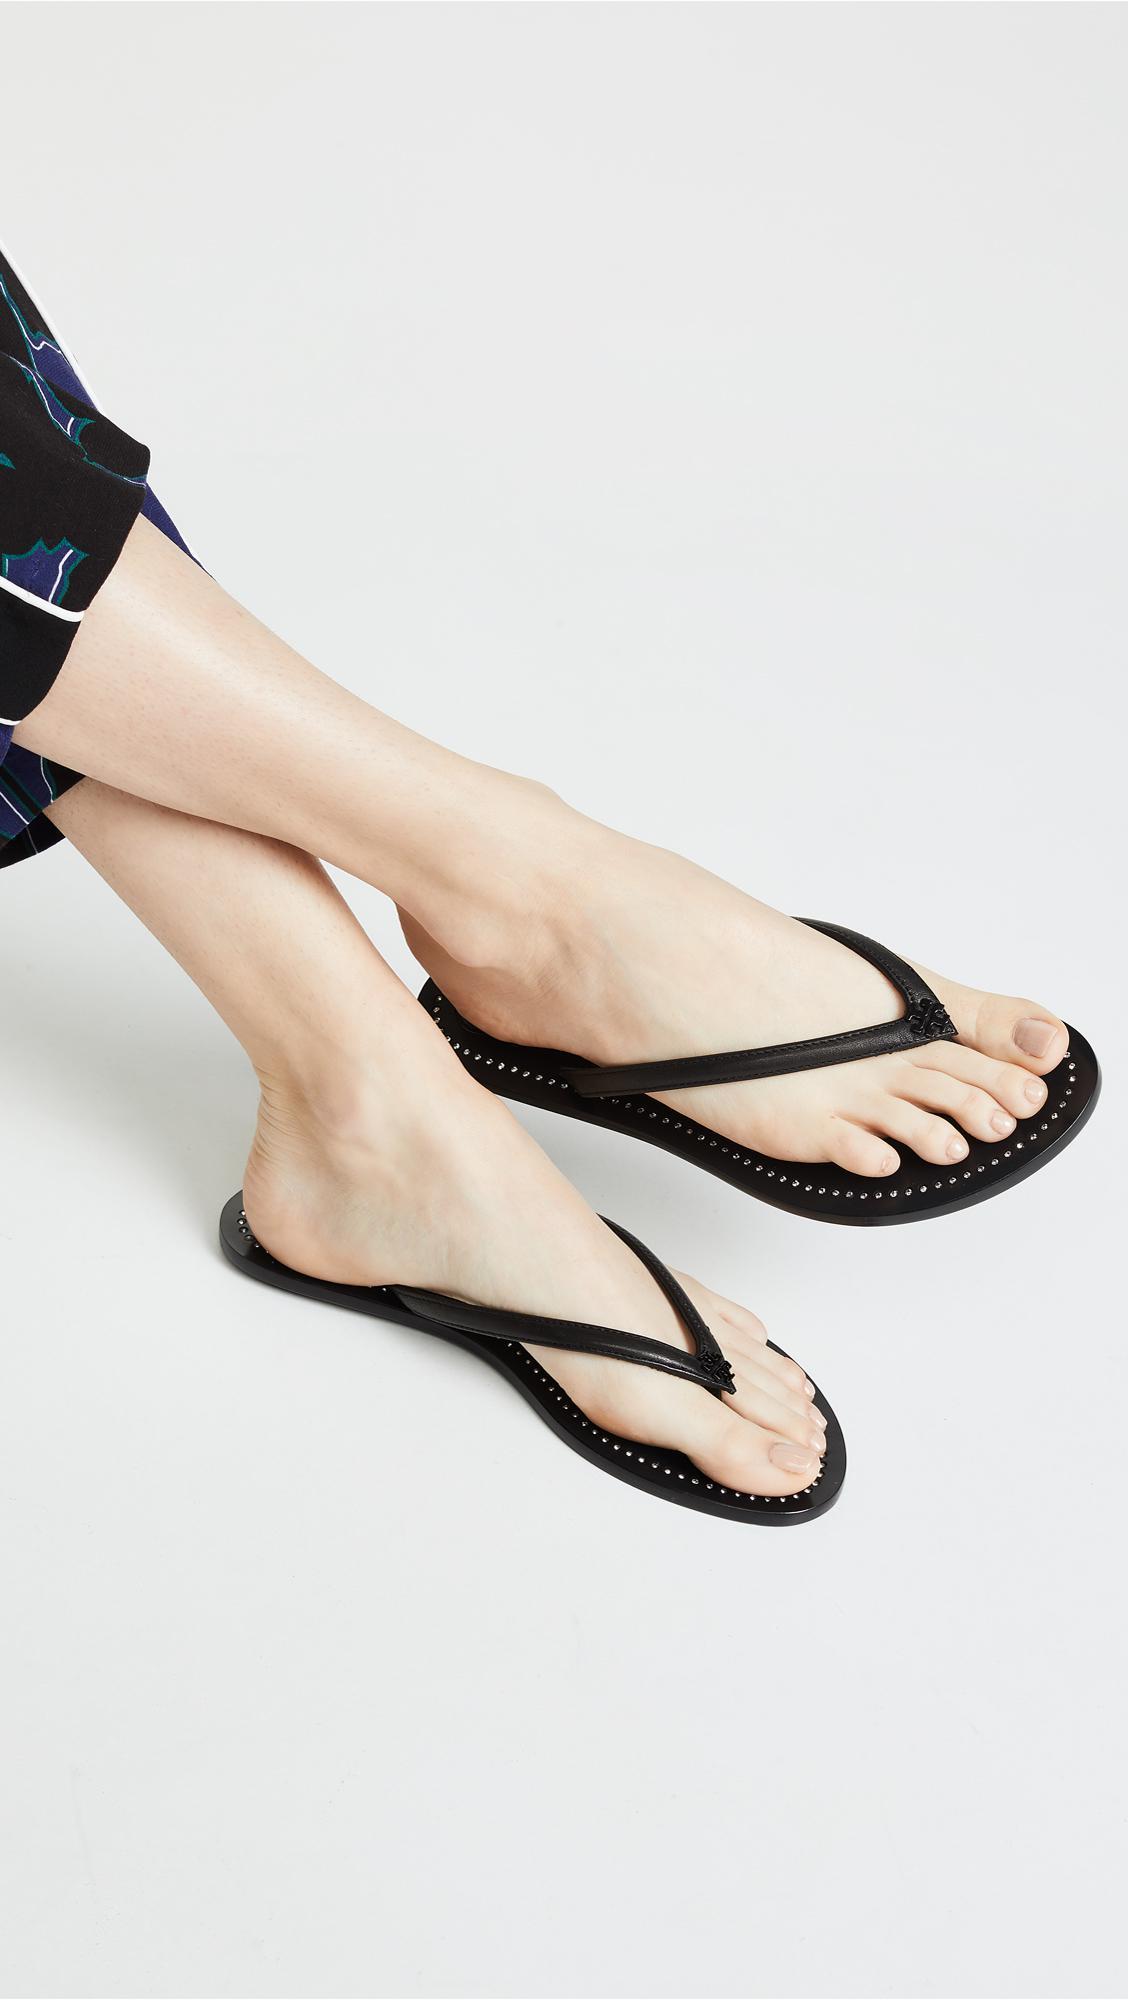 6c9b4eb077e0 Tory Burch - Black Liana Thong Sandals - Lyst. View fullscreen